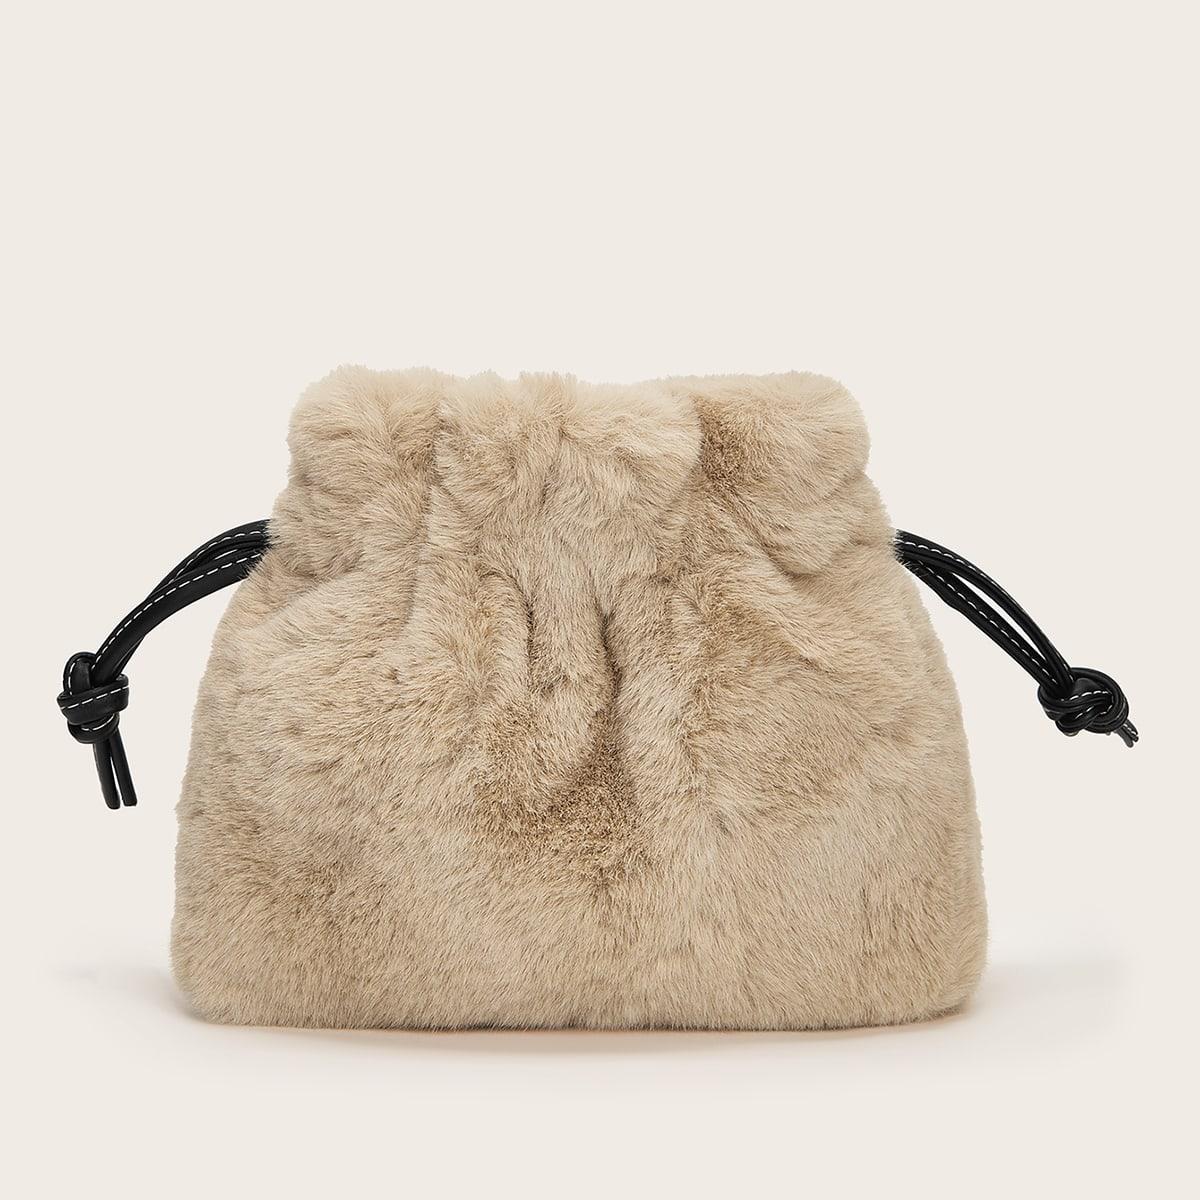 Плюшевая сумка на цепочке